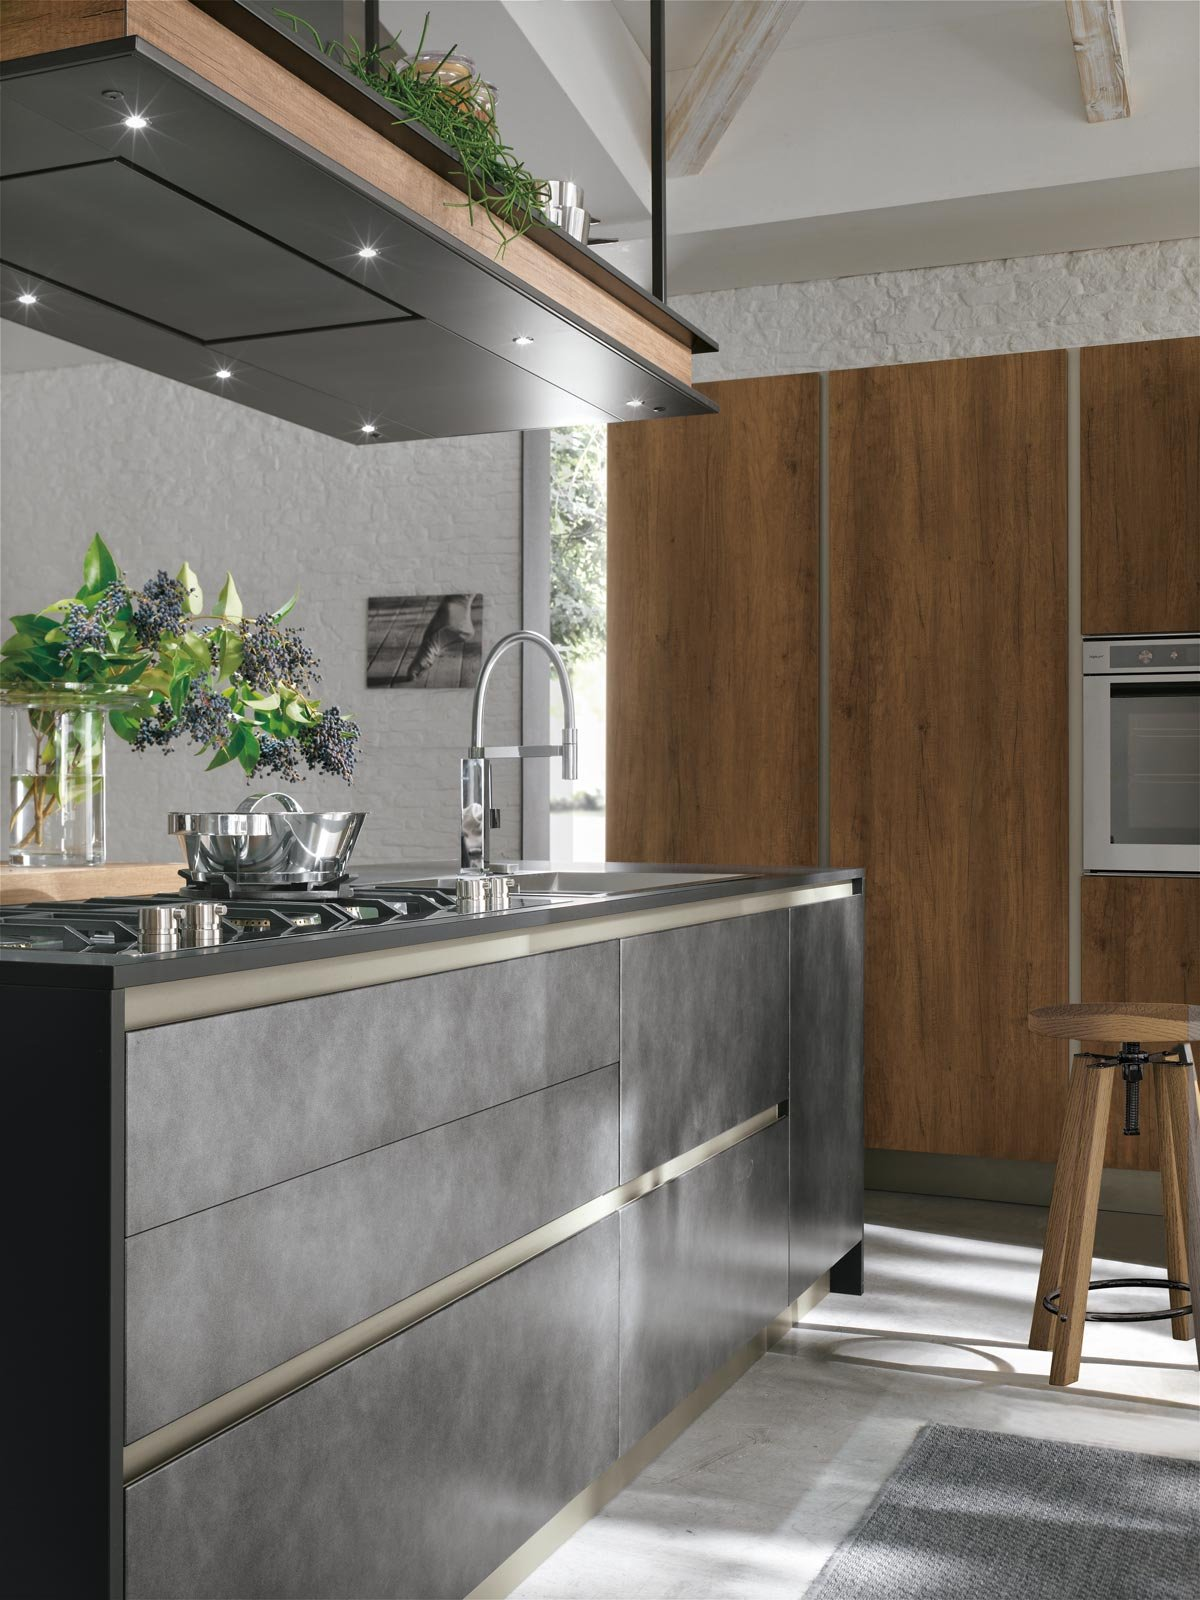 eurocucina 2016 superfici soft touch per le nuove cucine cose di casa. Black Bedroom Furniture Sets. Home Design Ideas